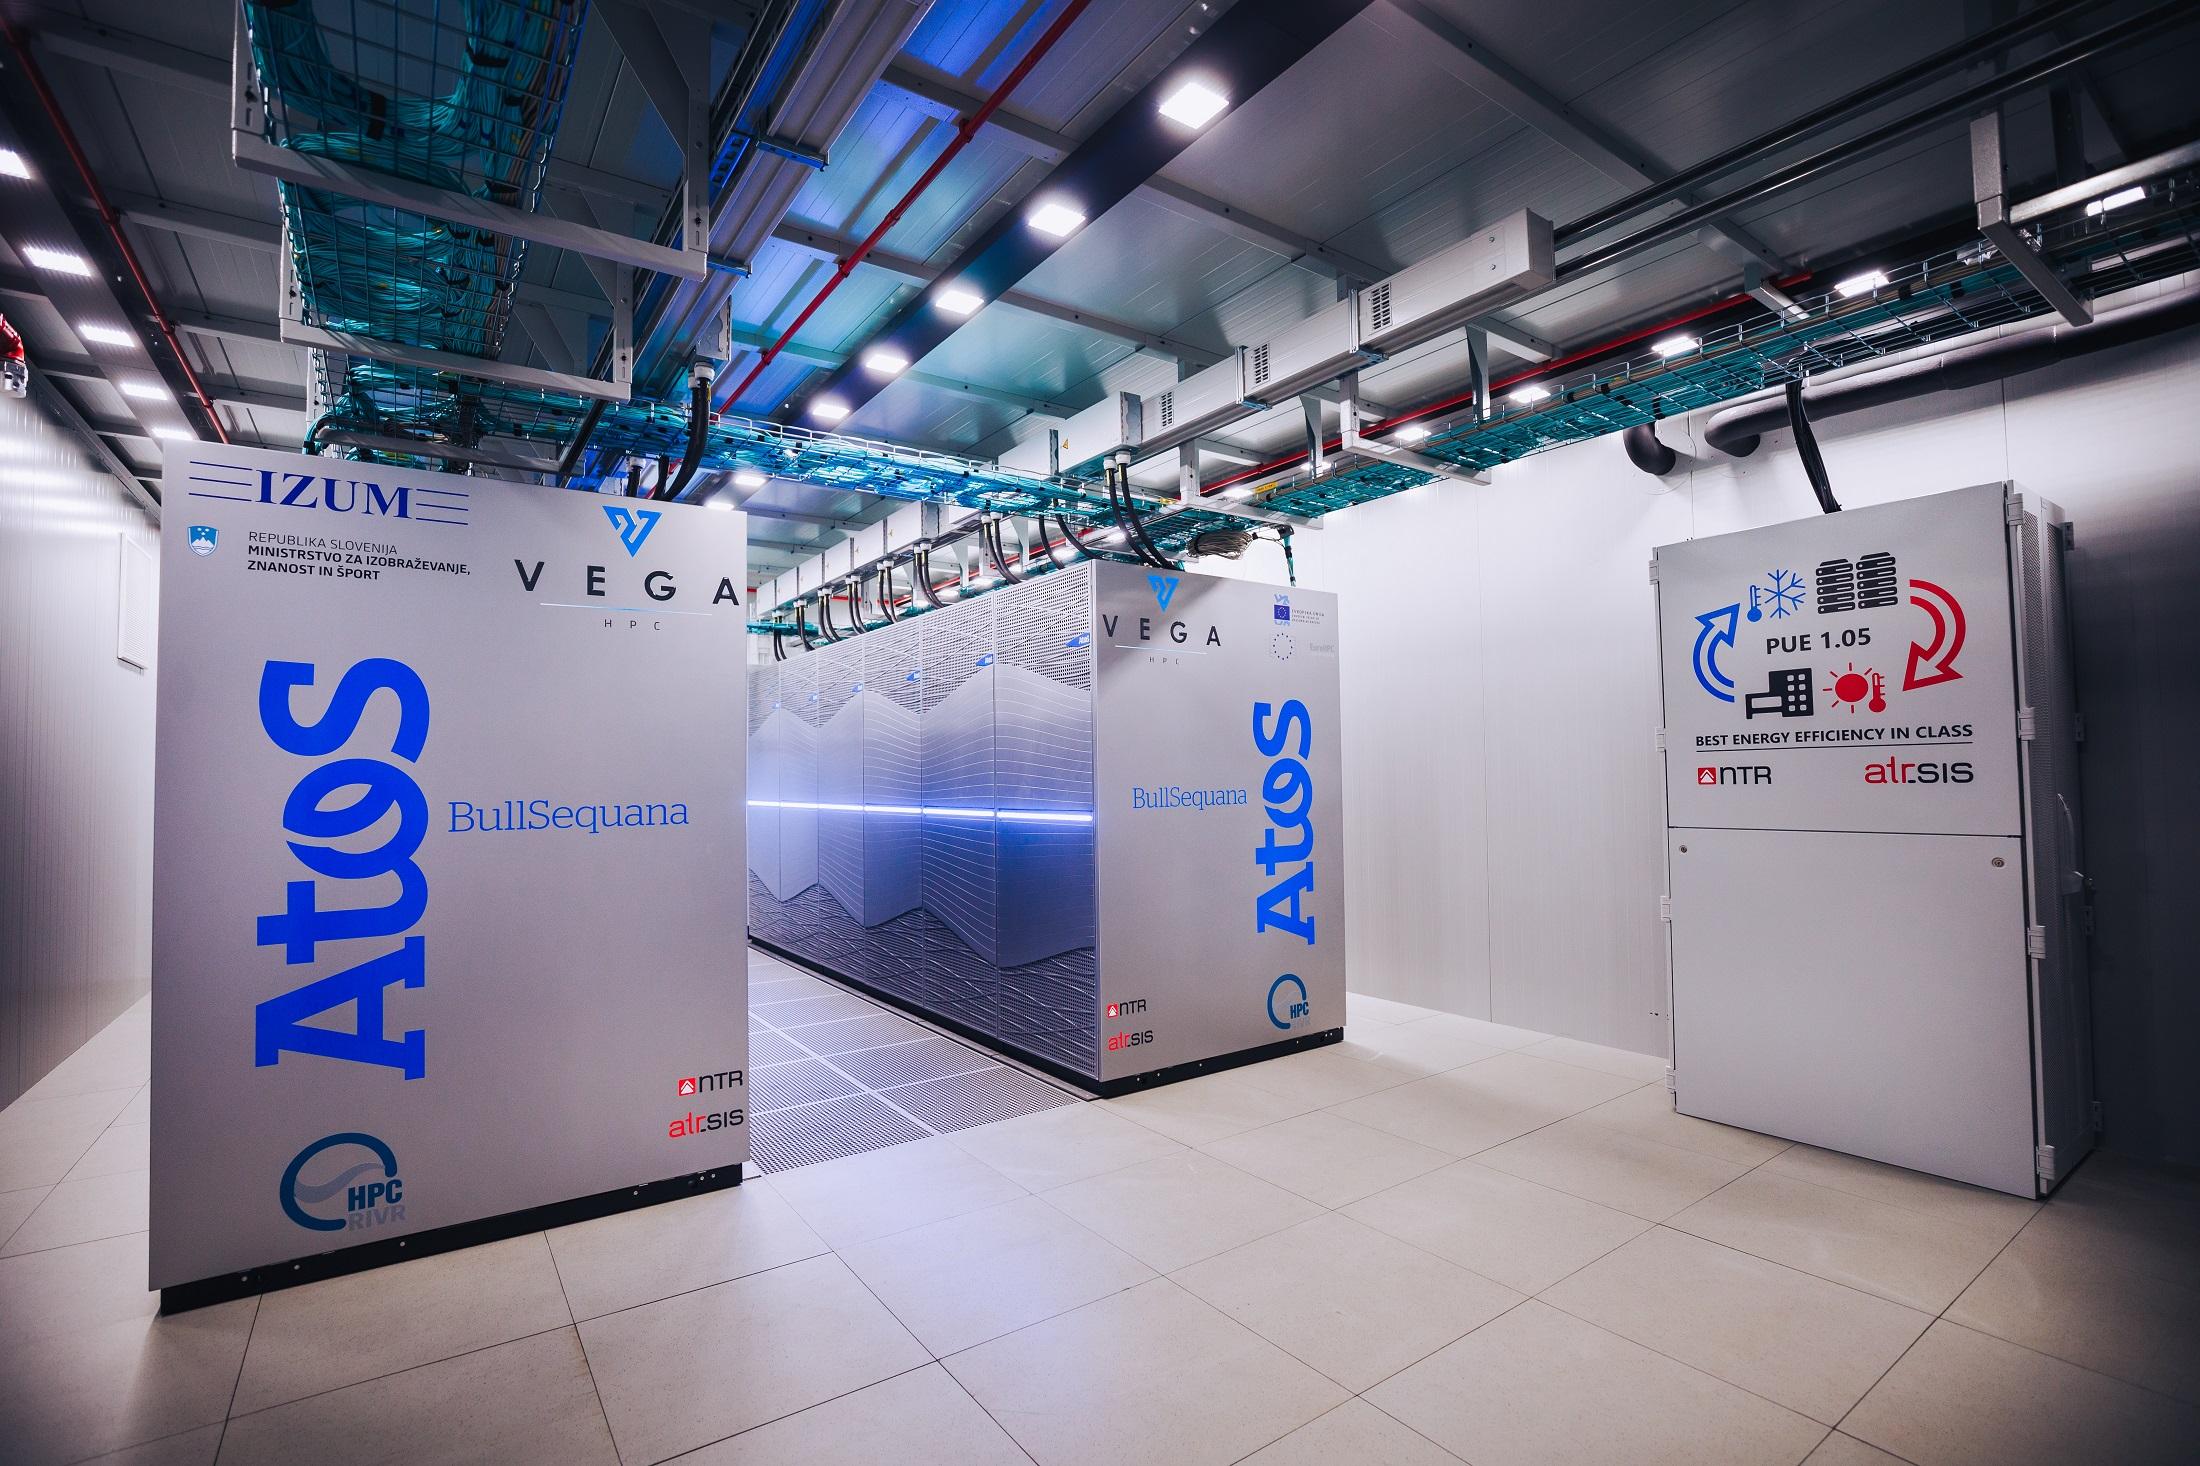 The first EuroHPC supercomputer Vega open for access